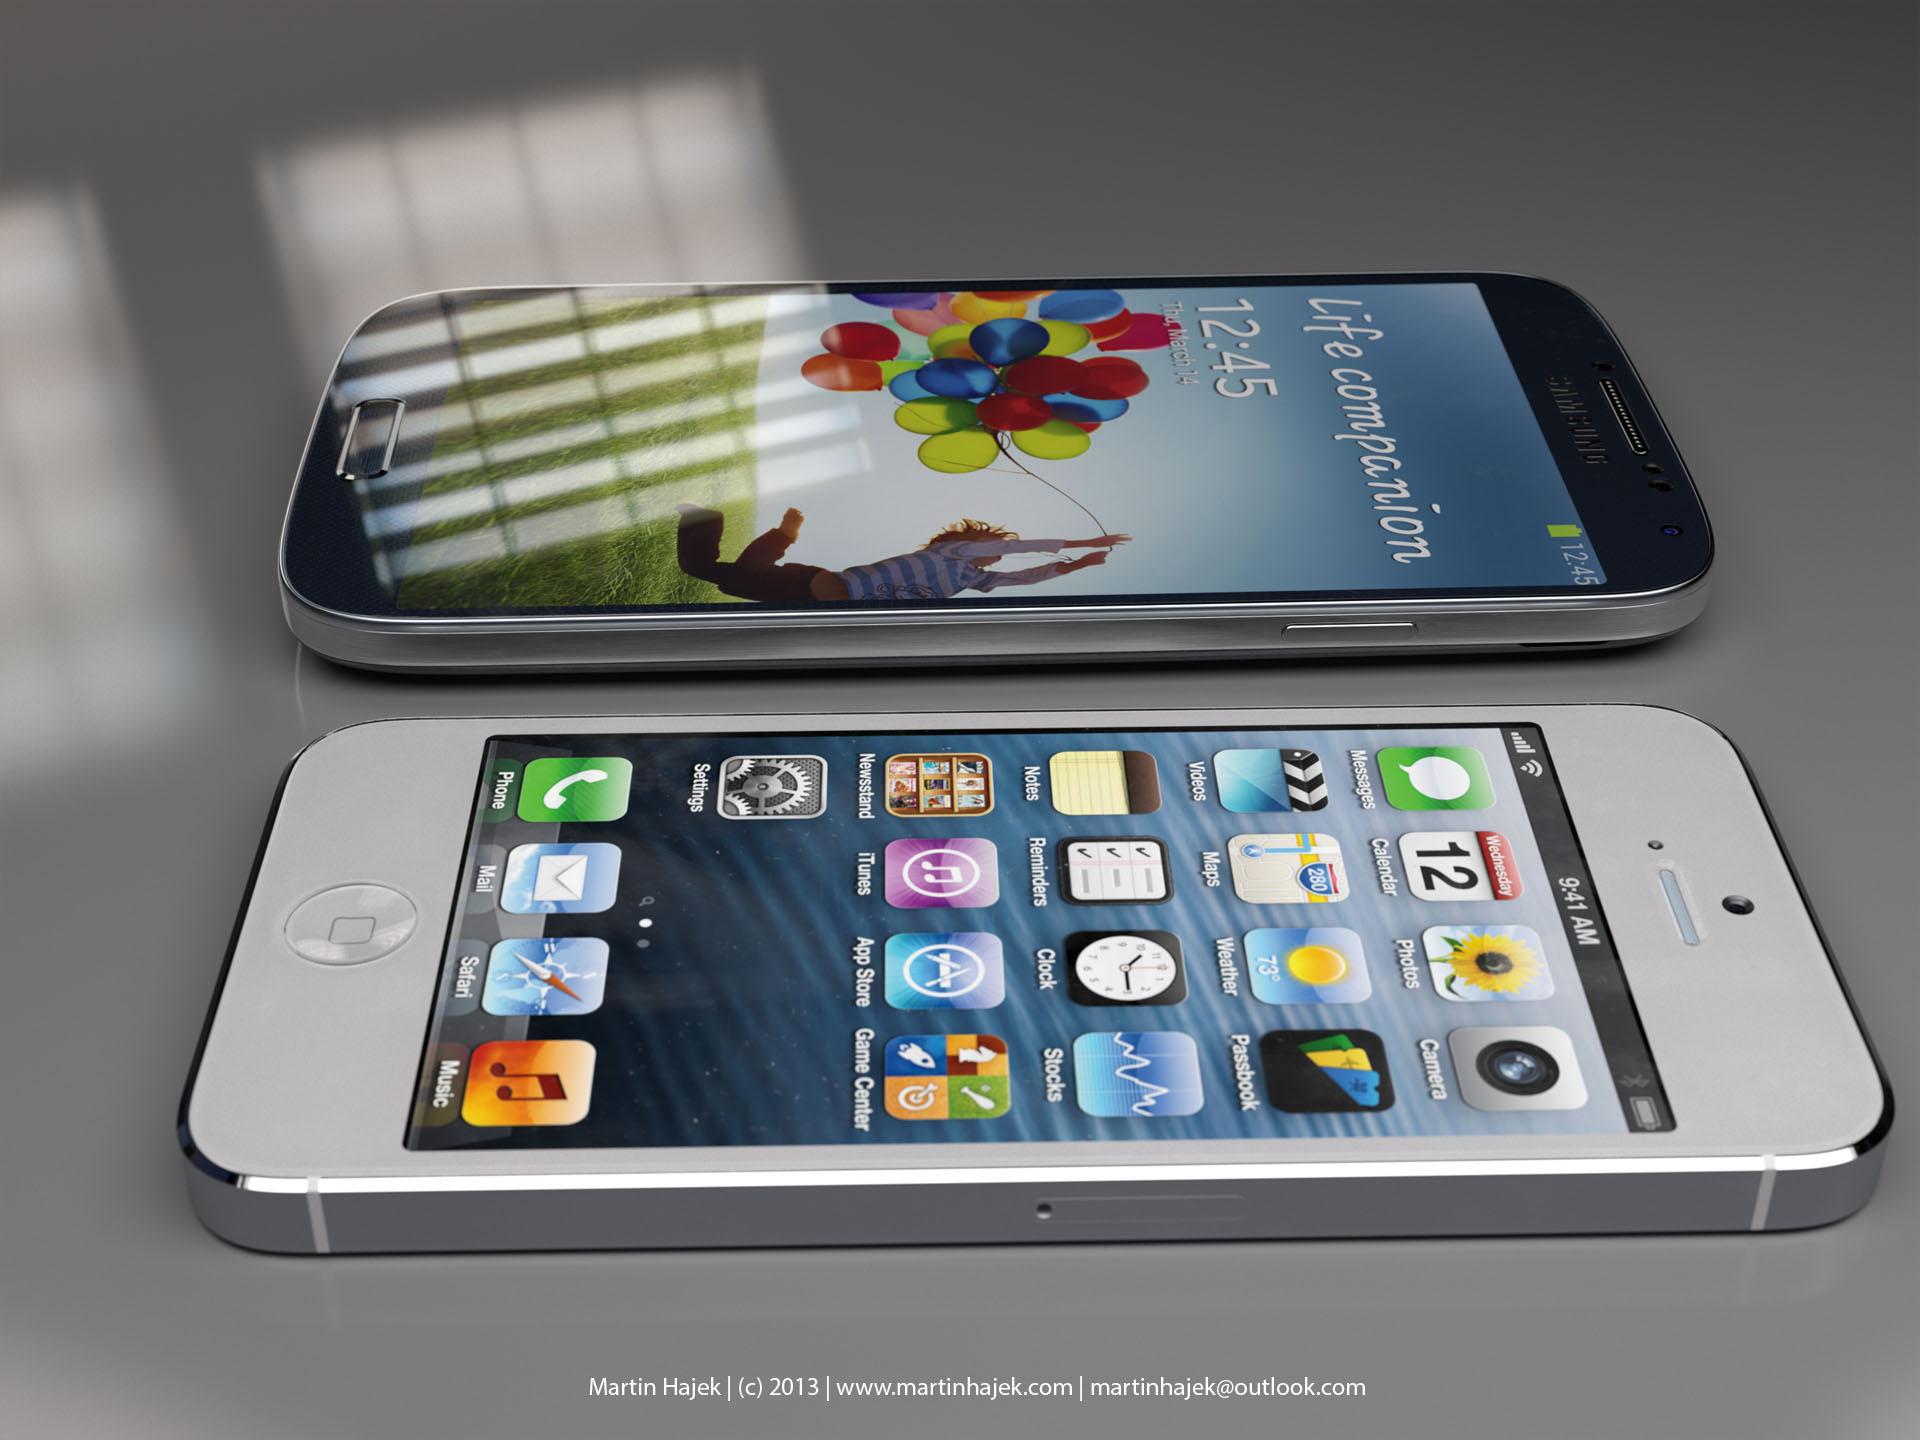 Size comparison (Galaxy S4 vs iPhone 5, Martin Hajek 005)